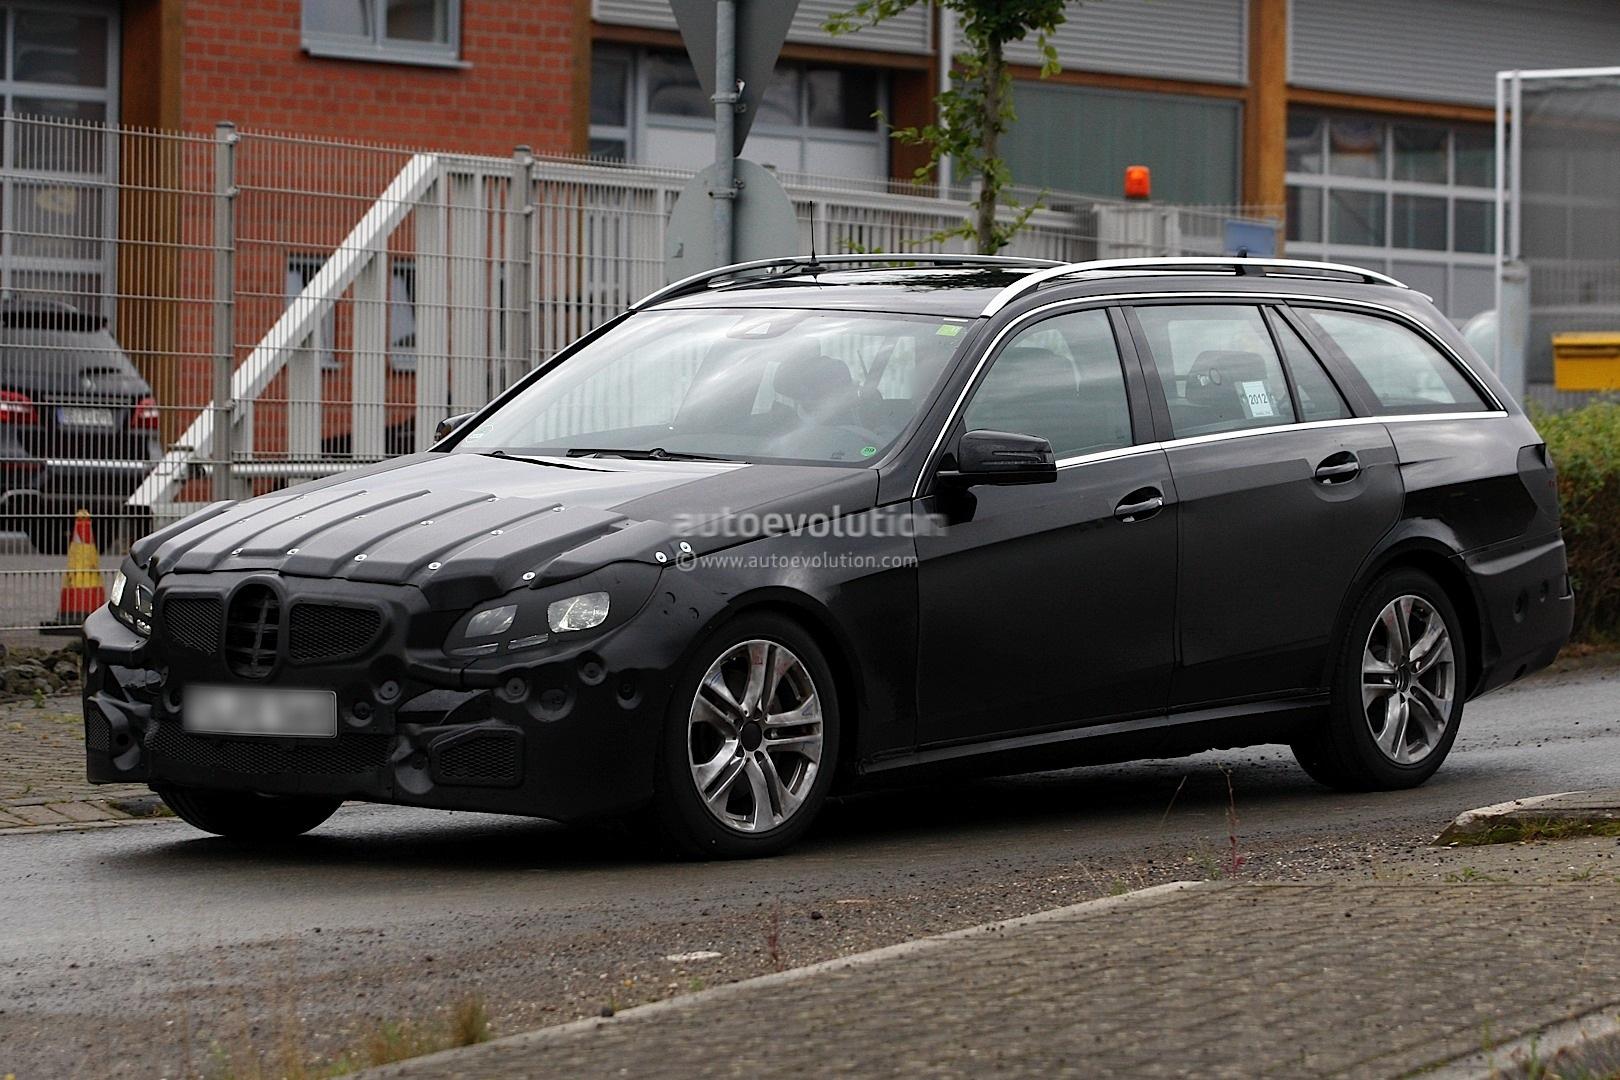 Spyshots 2014 mercedes benz e class estate autoevolution for New mercedes benz e class 2014